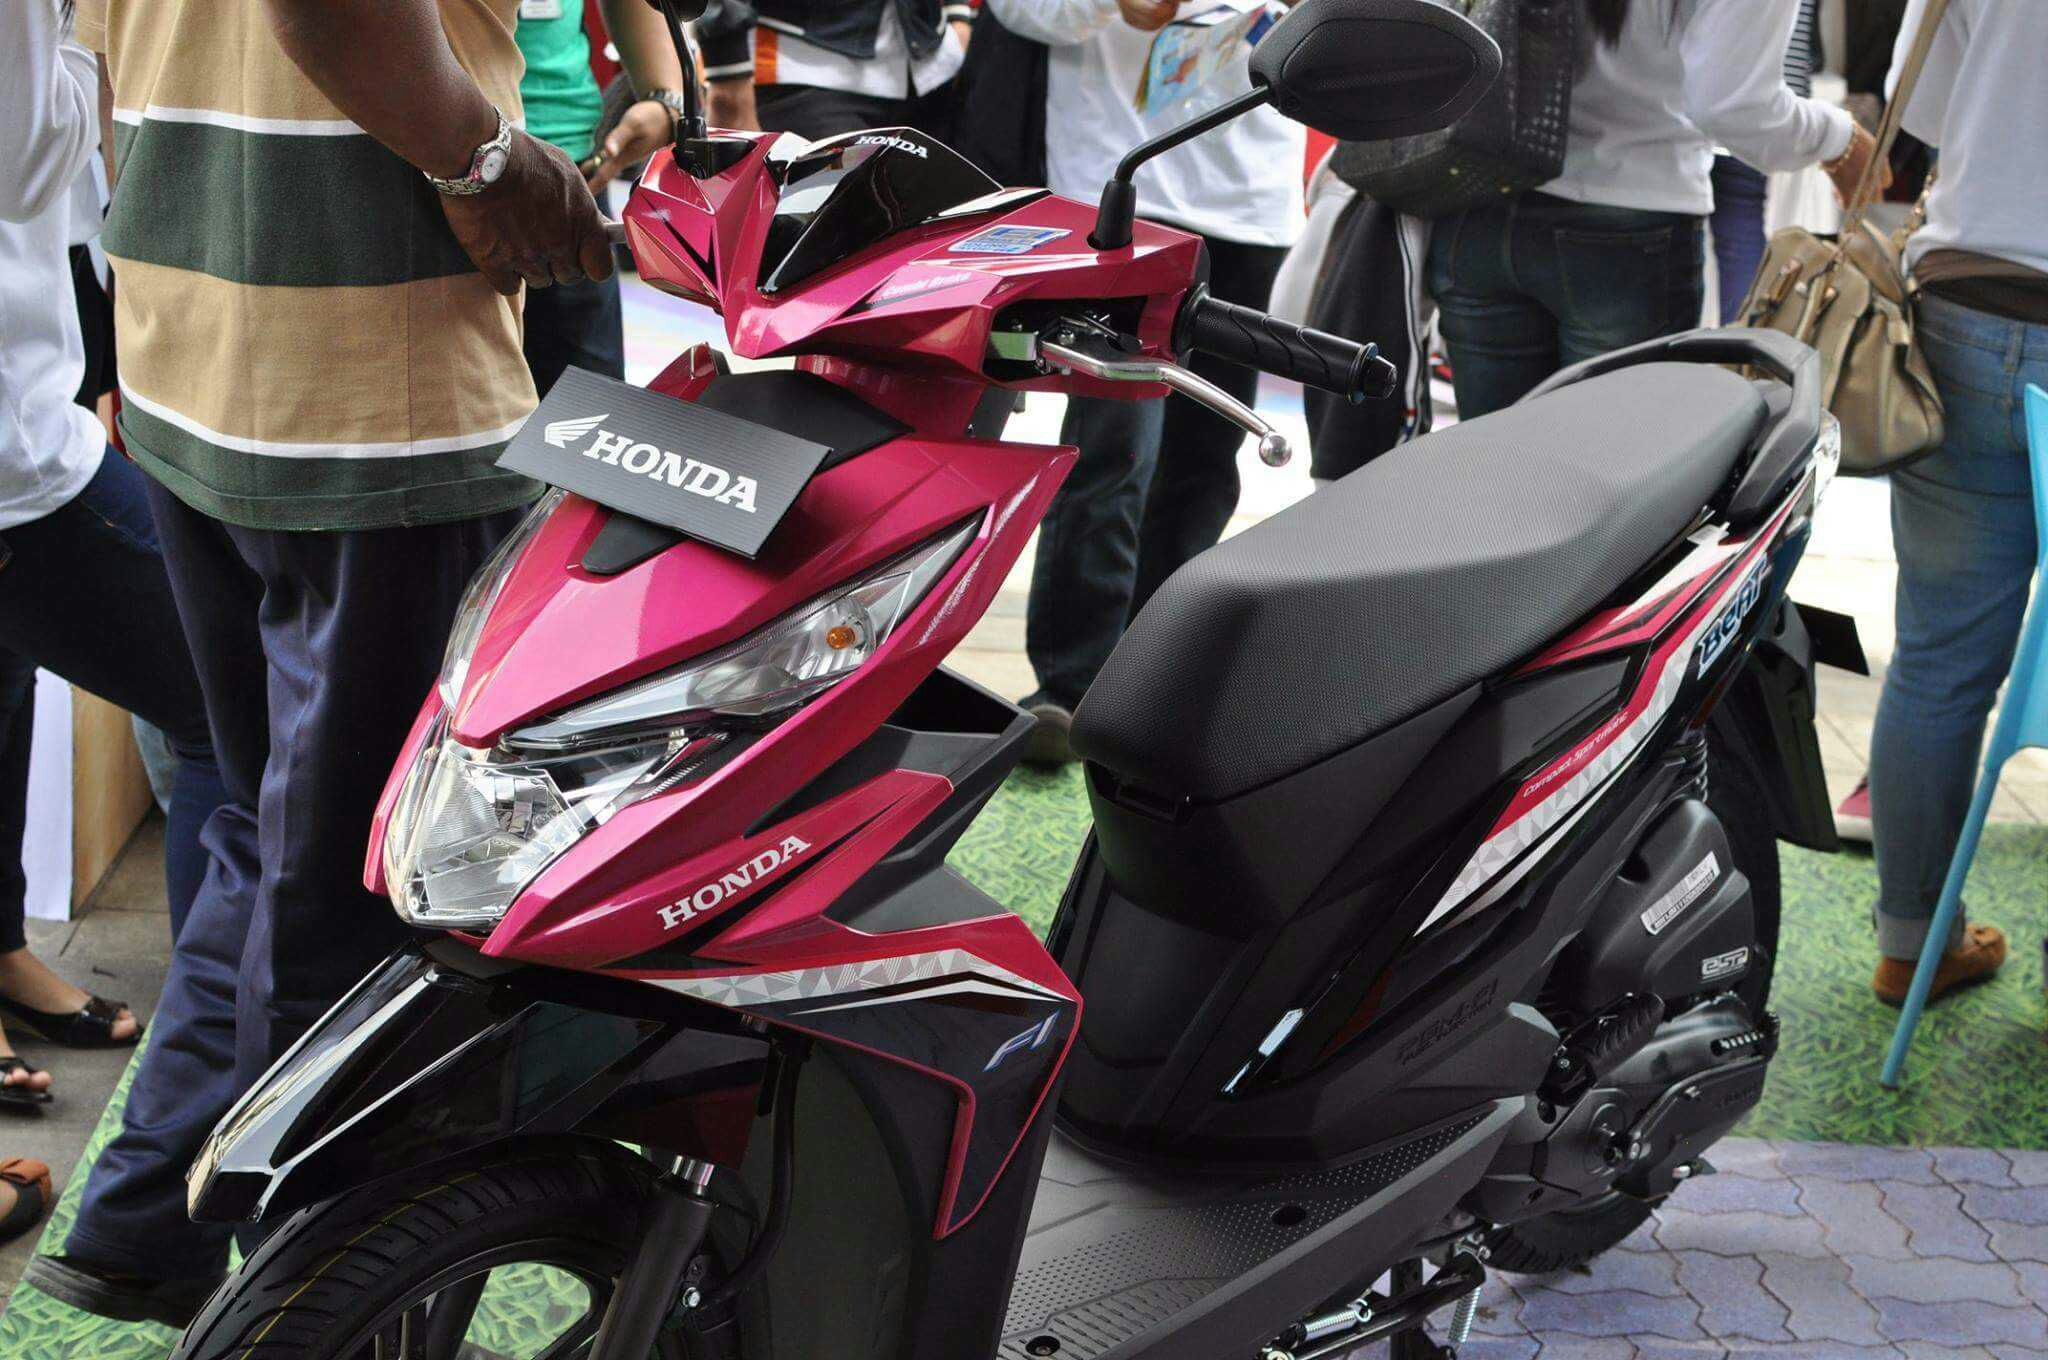 Koleksi 83 Modifikasi Honda Beat Esp Cbs Iss Terbaik Dan Terupdate